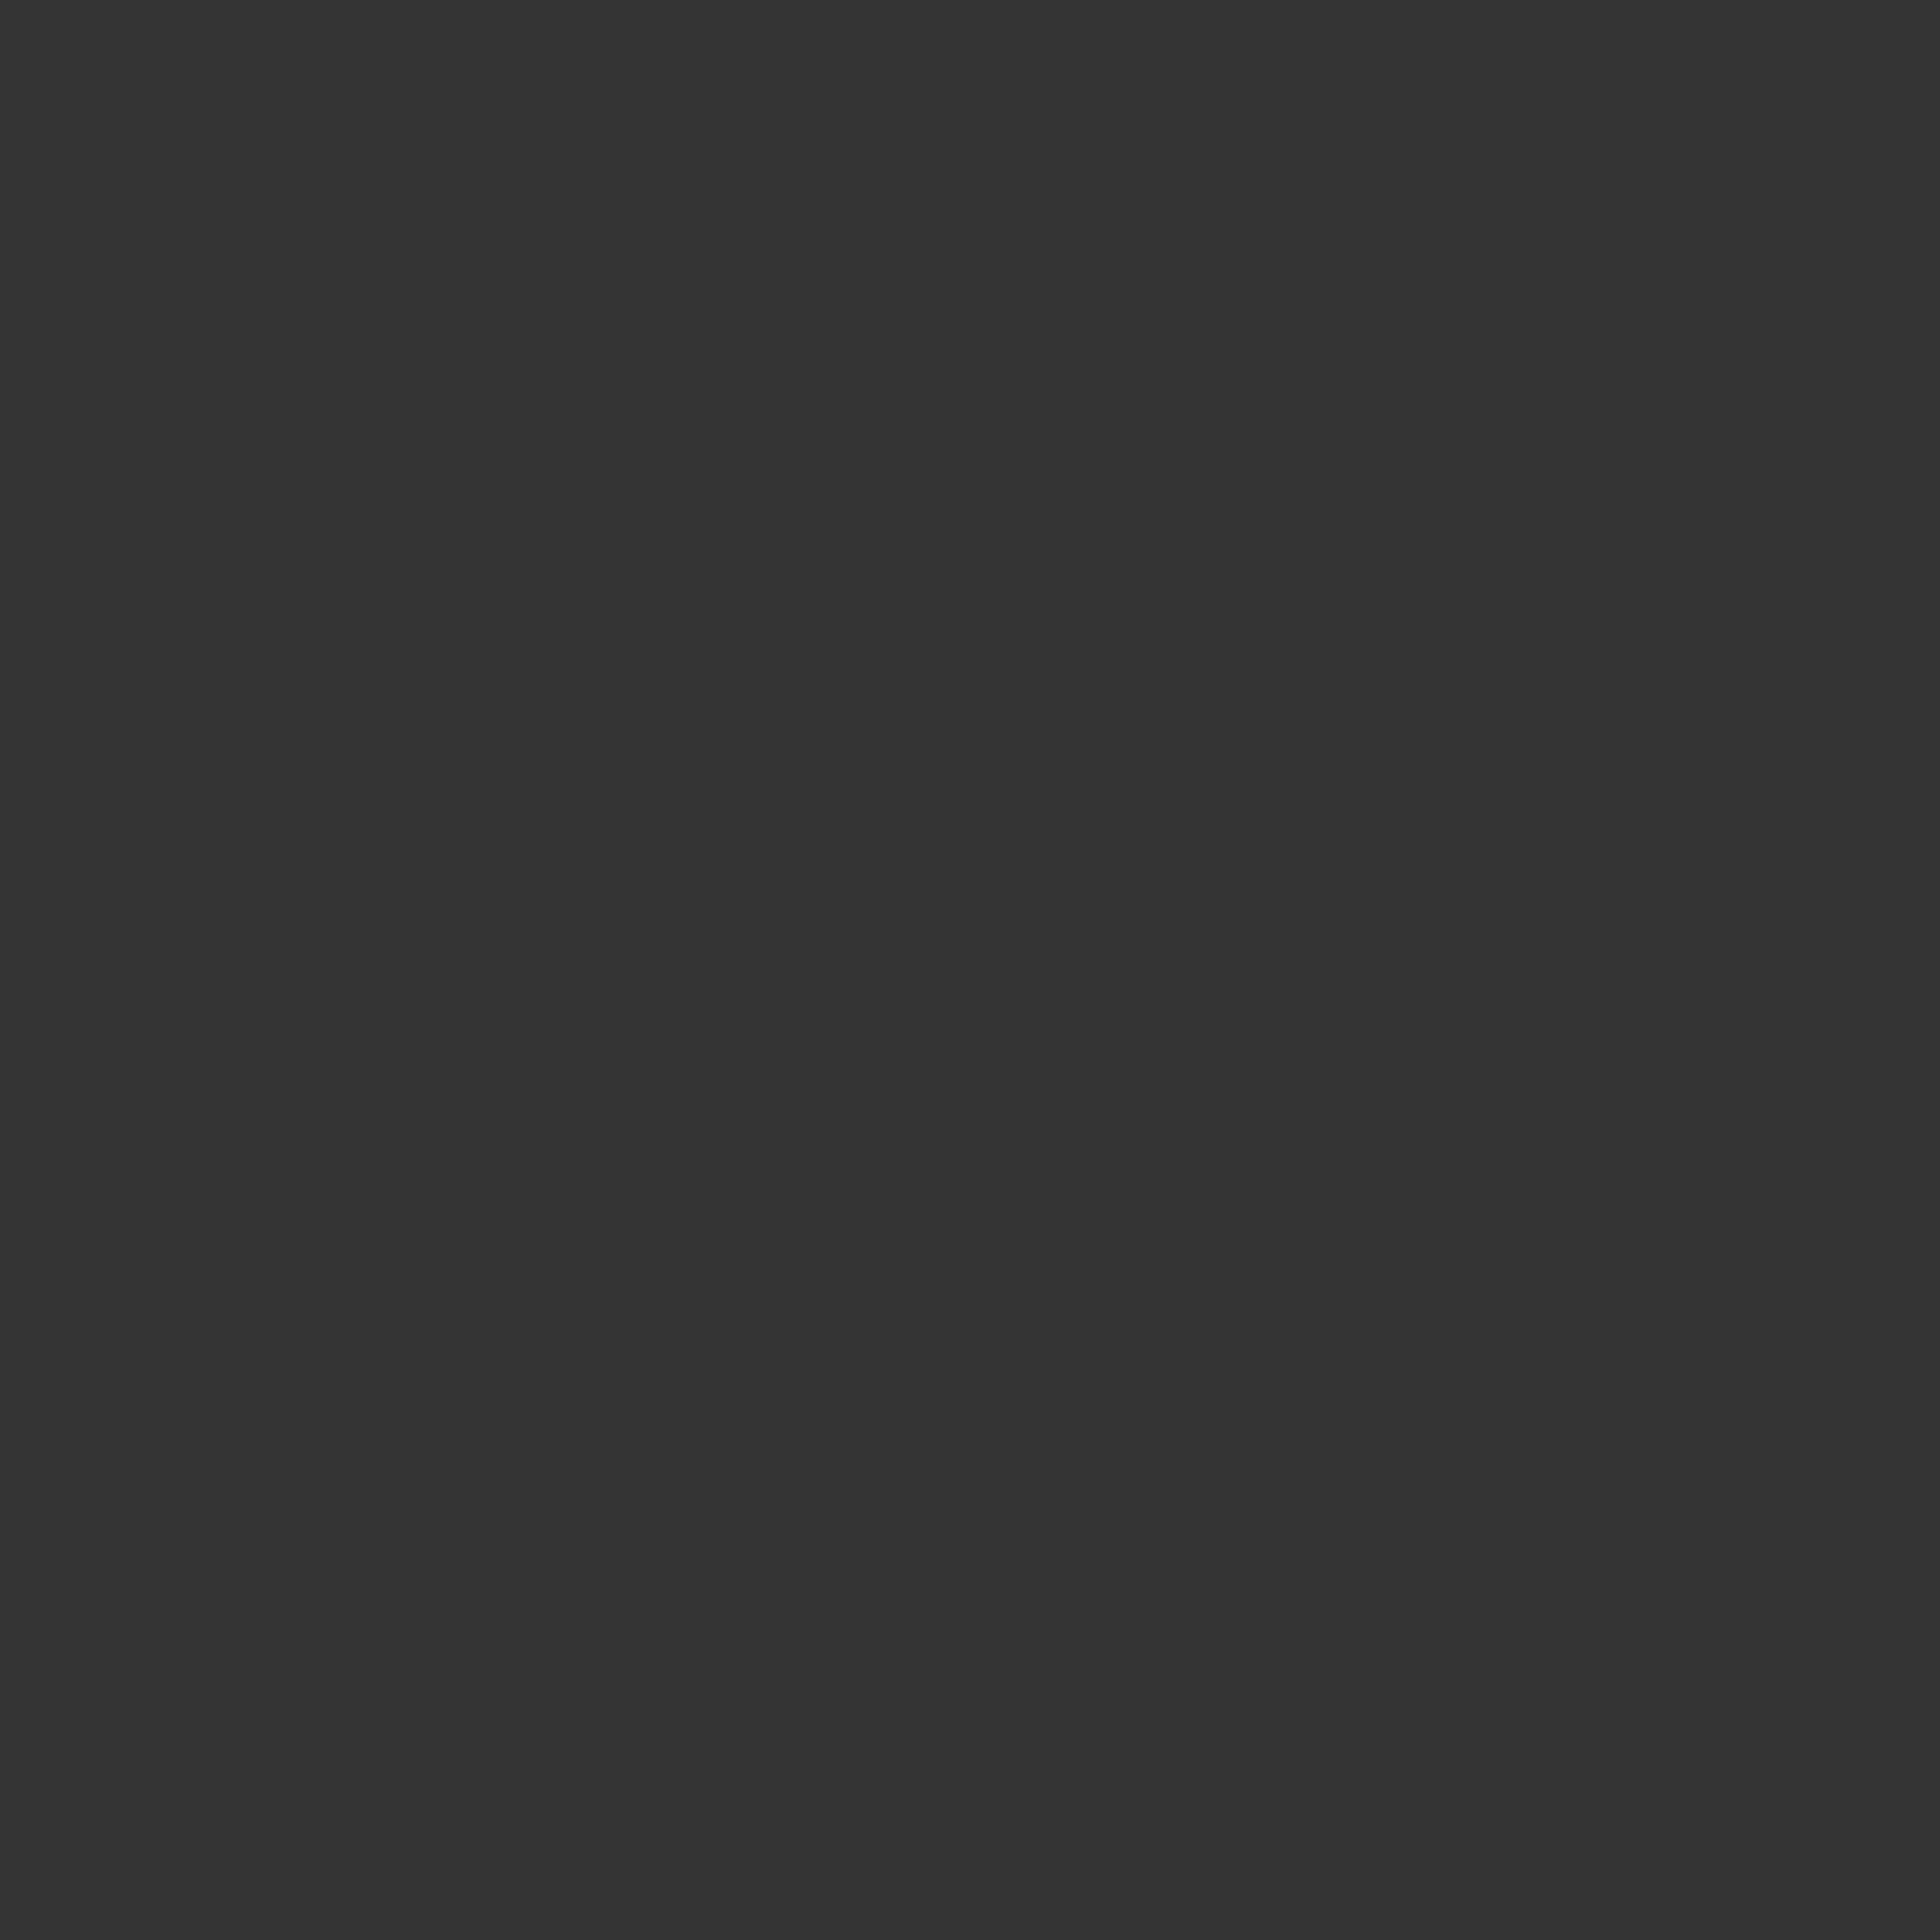 2732x2732 Jet Solid Color Background